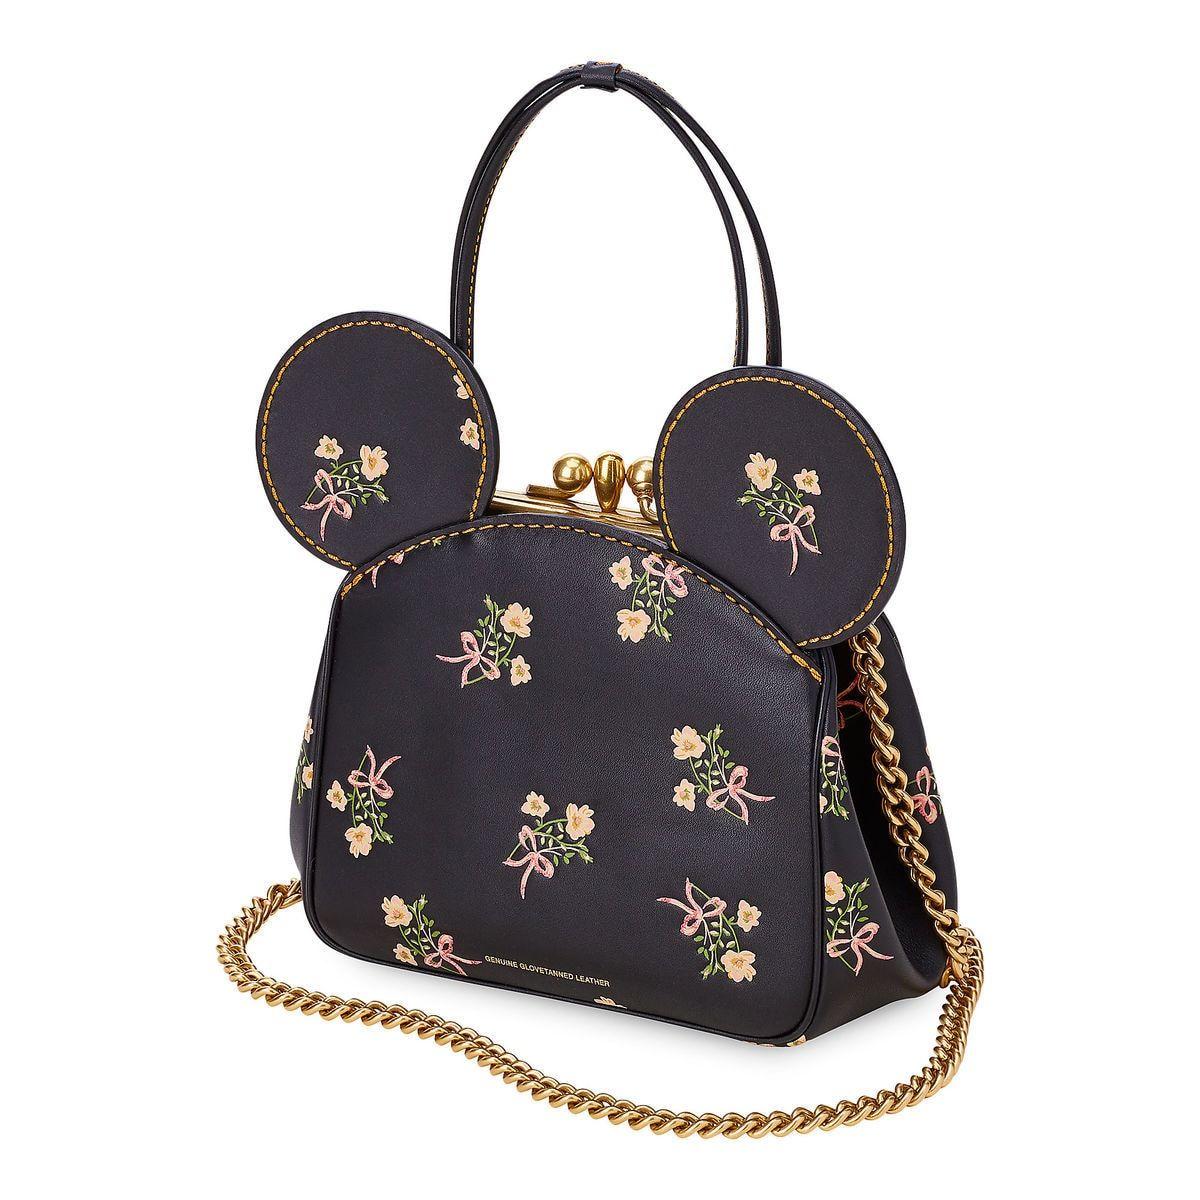 Minnie Mouse Floral Kisslock Leather Bag By Coach Black Bags